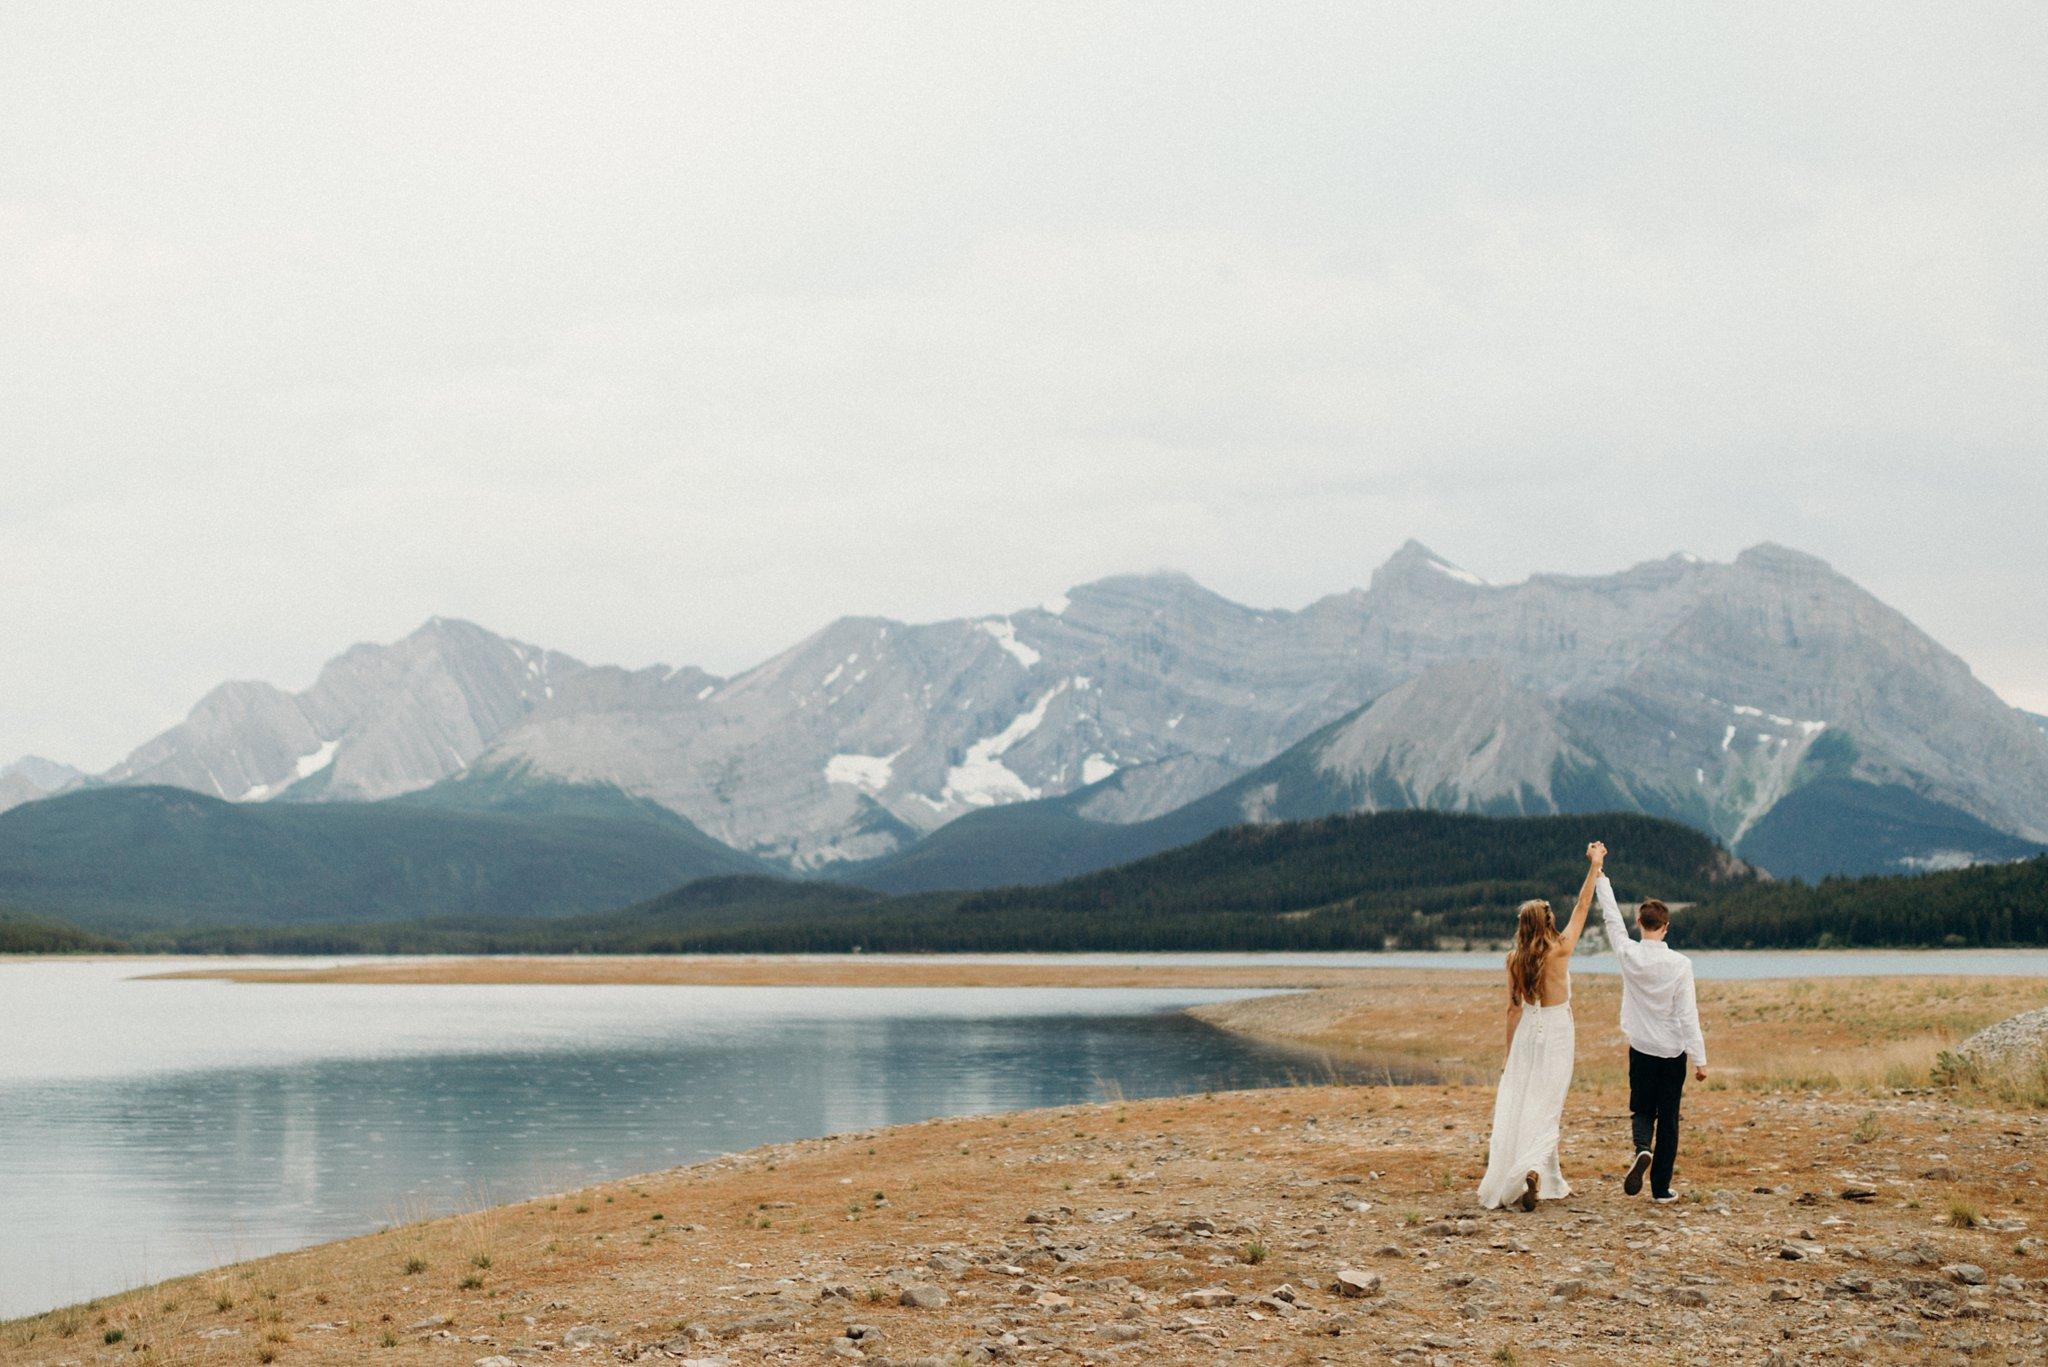 kaihla_tonai_intimate_wedding_elopement_photographer_6438.jpg